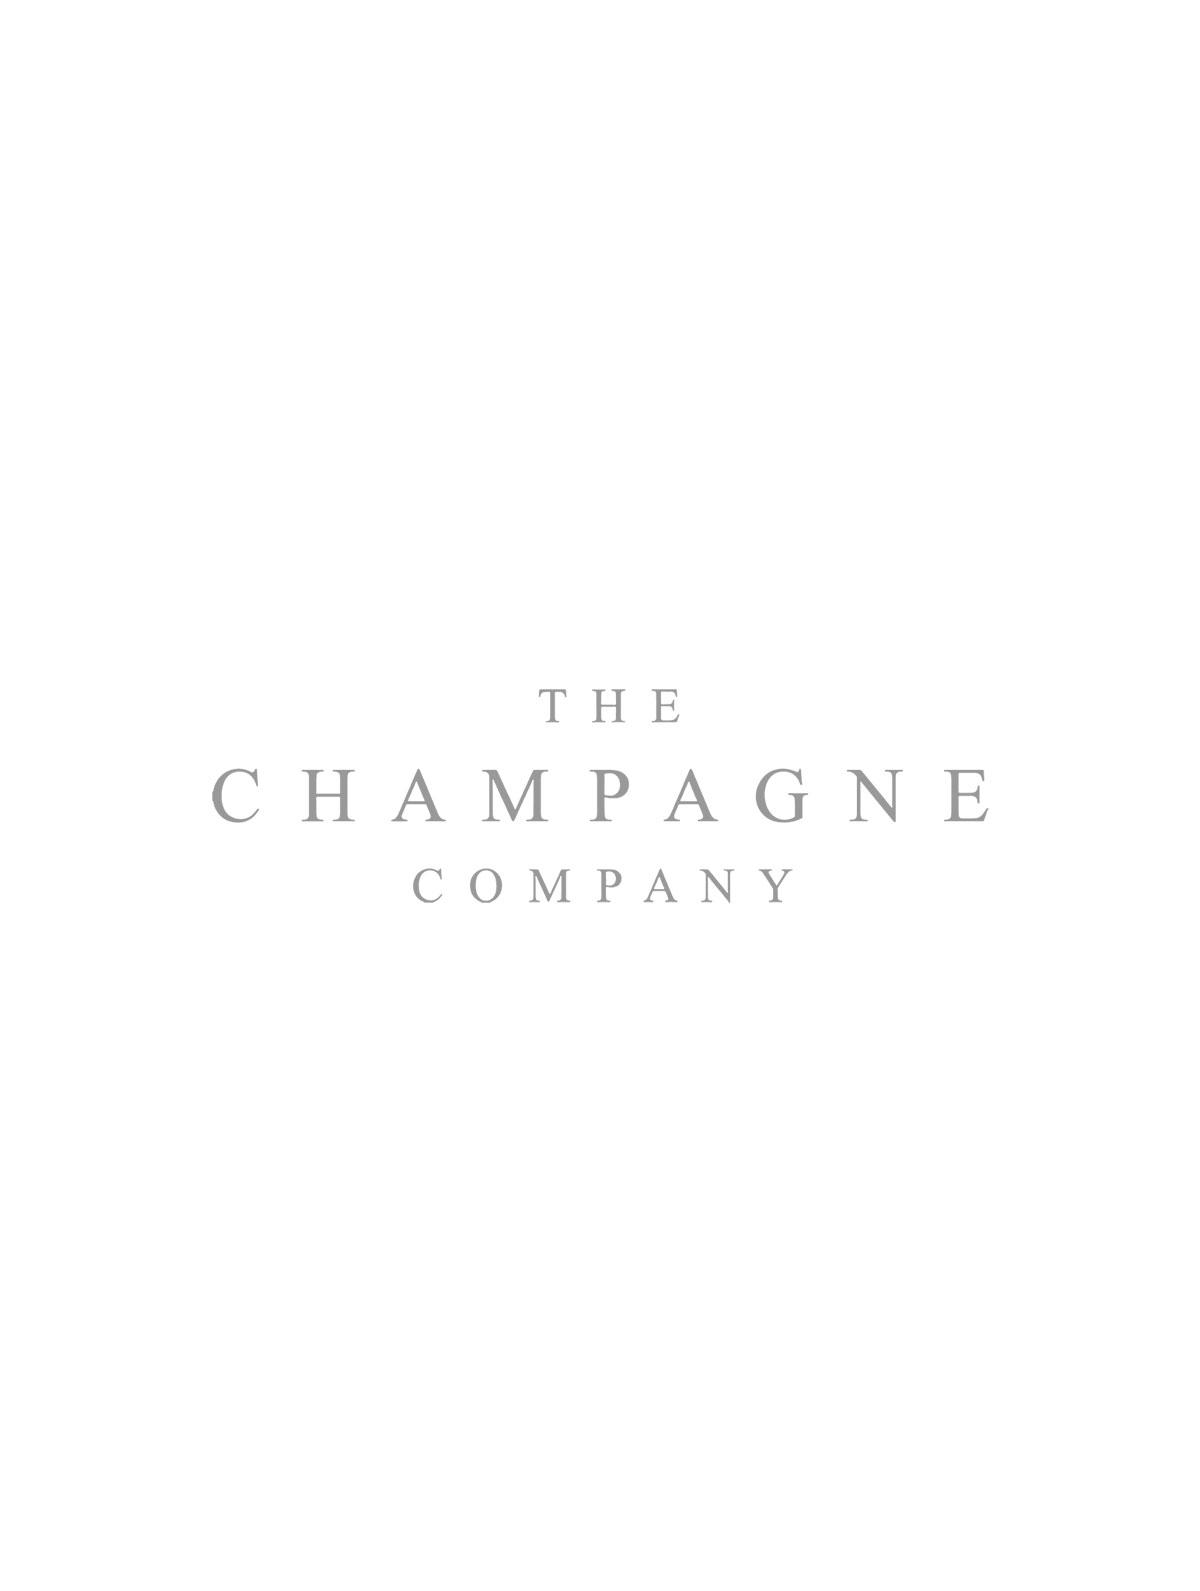 Glenmorangie 10 Year Old Single Malt Whisky Miniature 10cl Gift Box